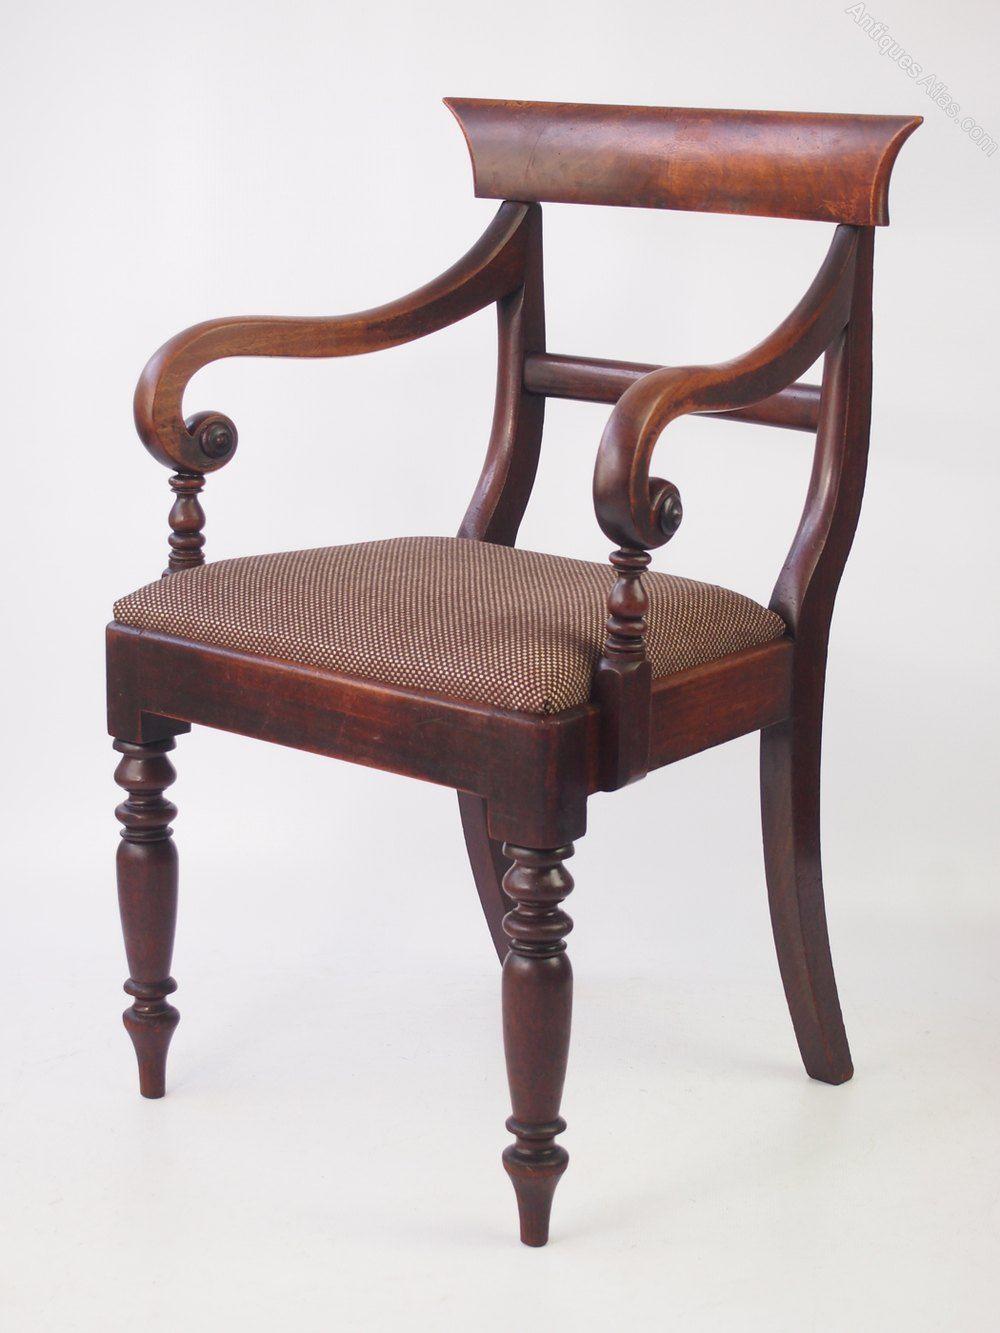 Victorian Mahogany Open Armchair Or Desk Chair Antiques Atlas Com Imagens Moveis Cadeiras